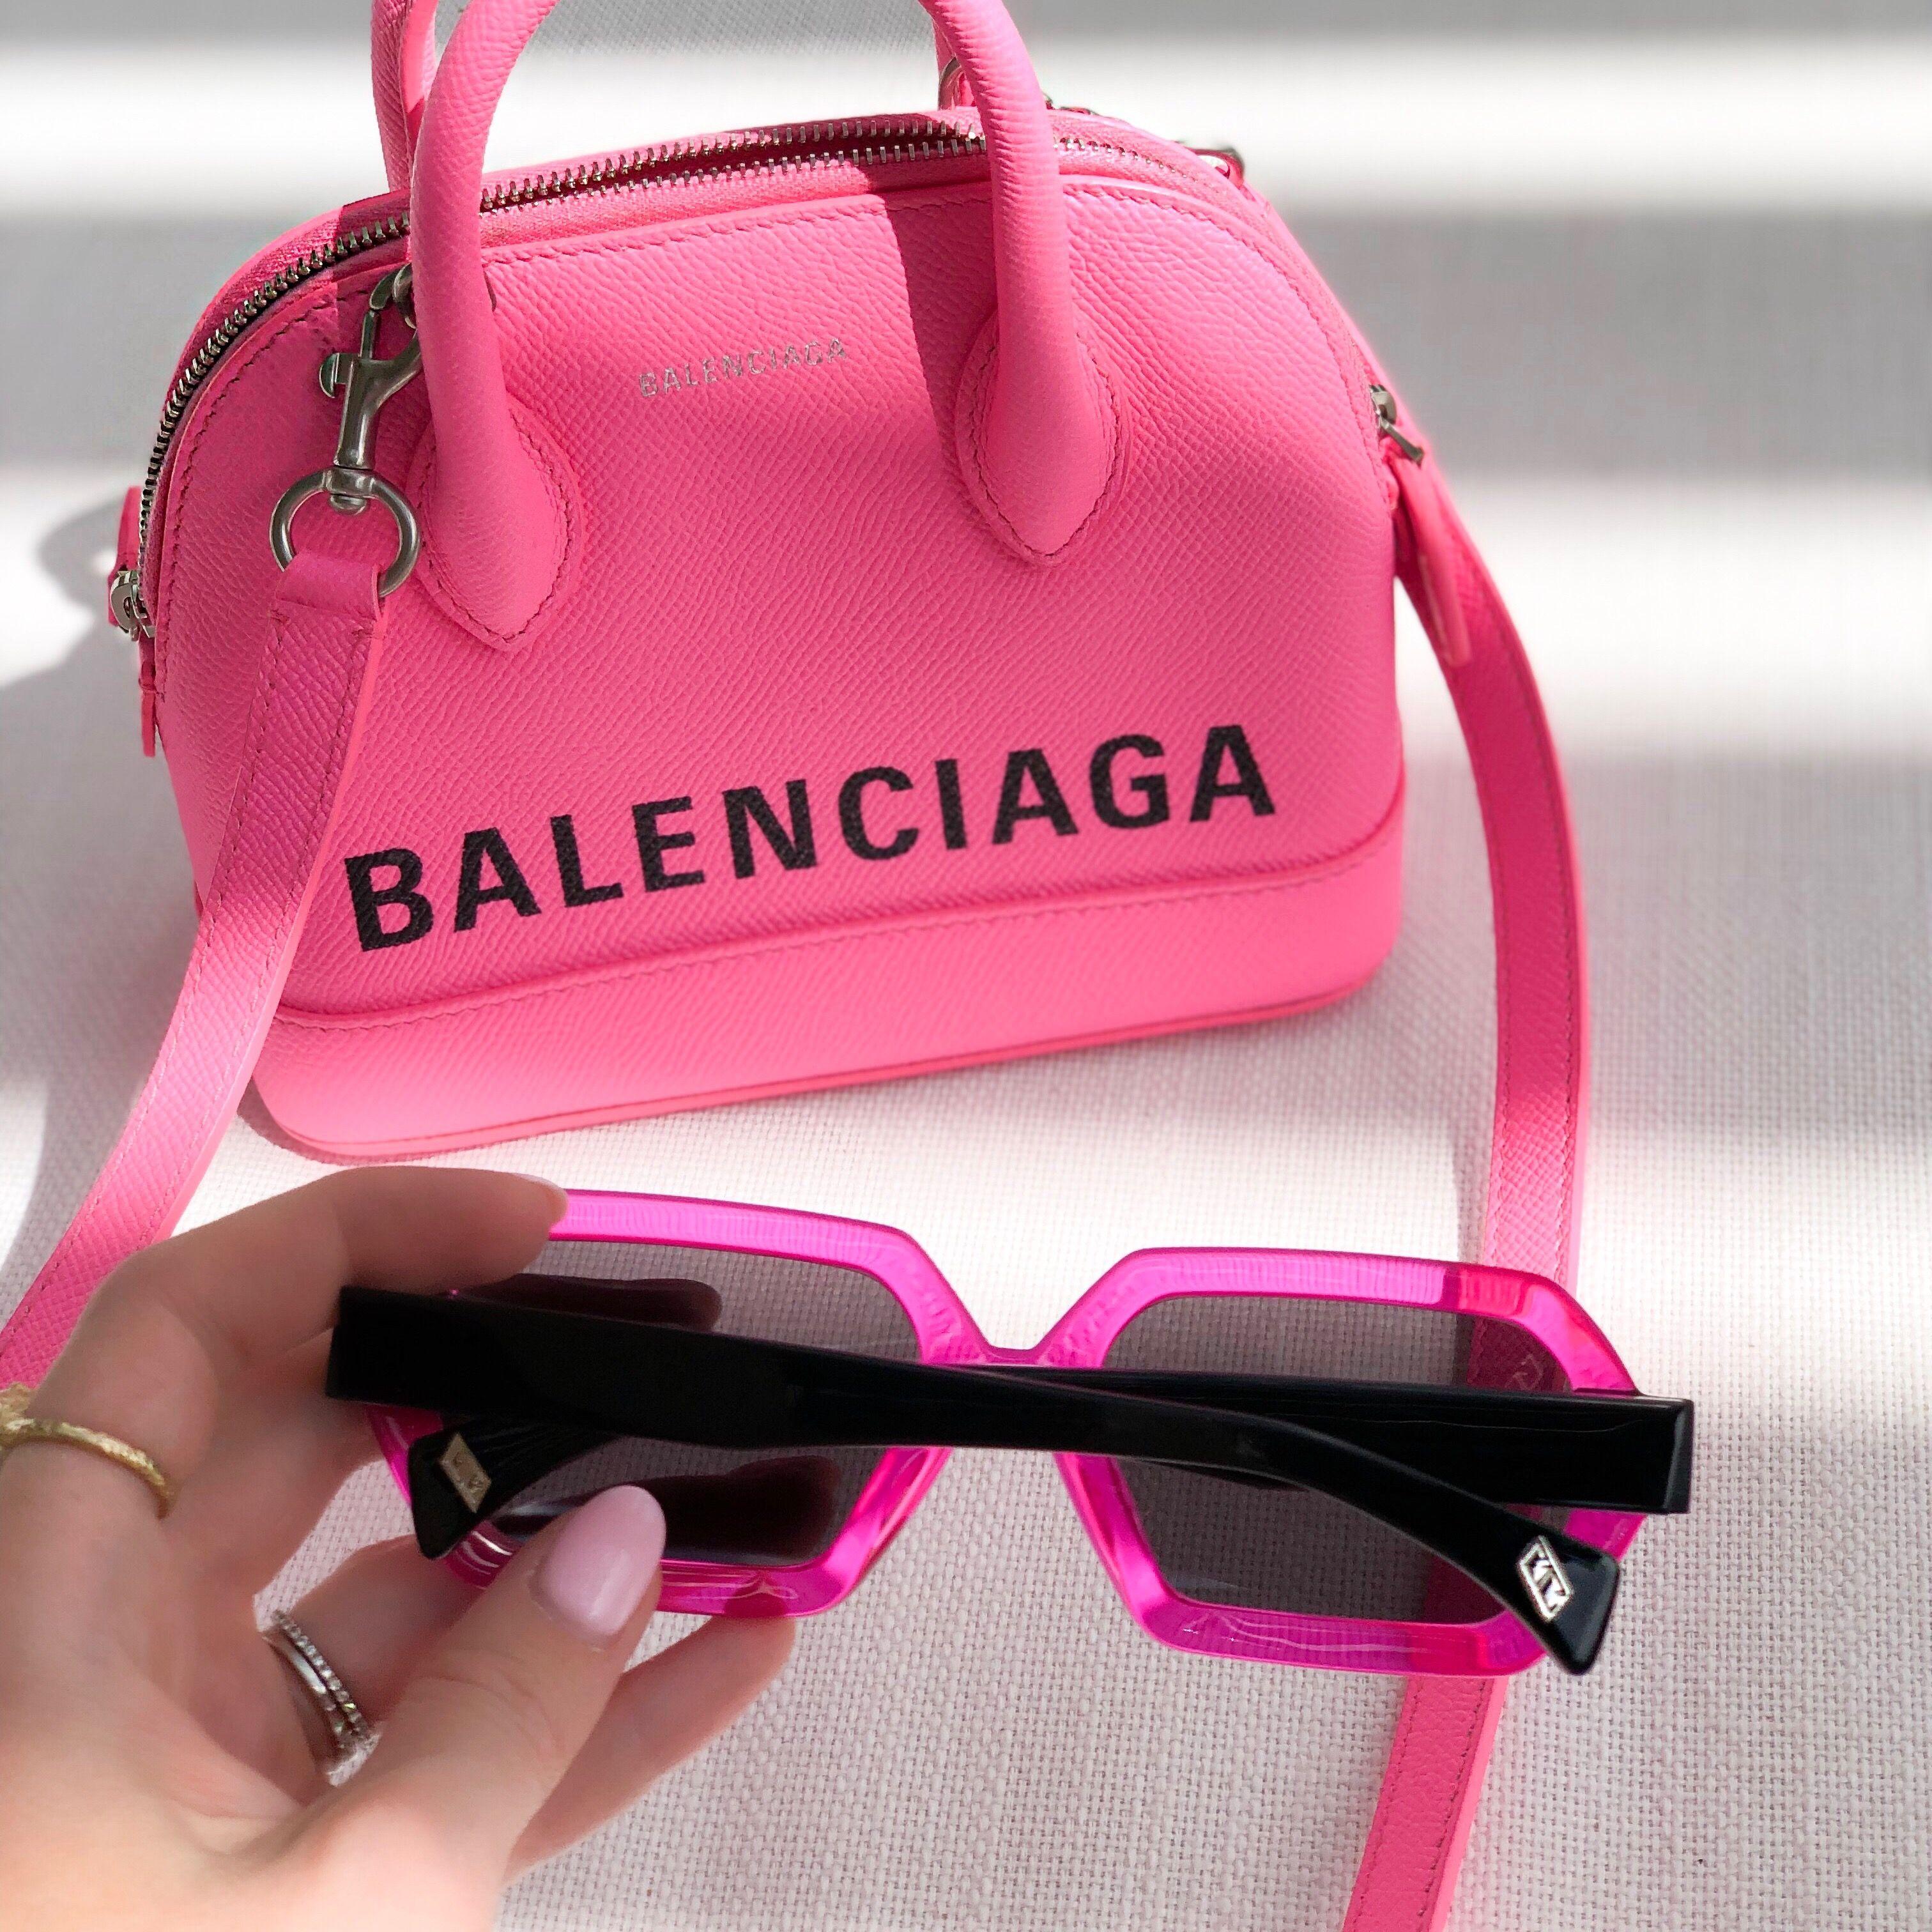 Neon pink Balenciaga bag and GEM+ELLI sunglasses